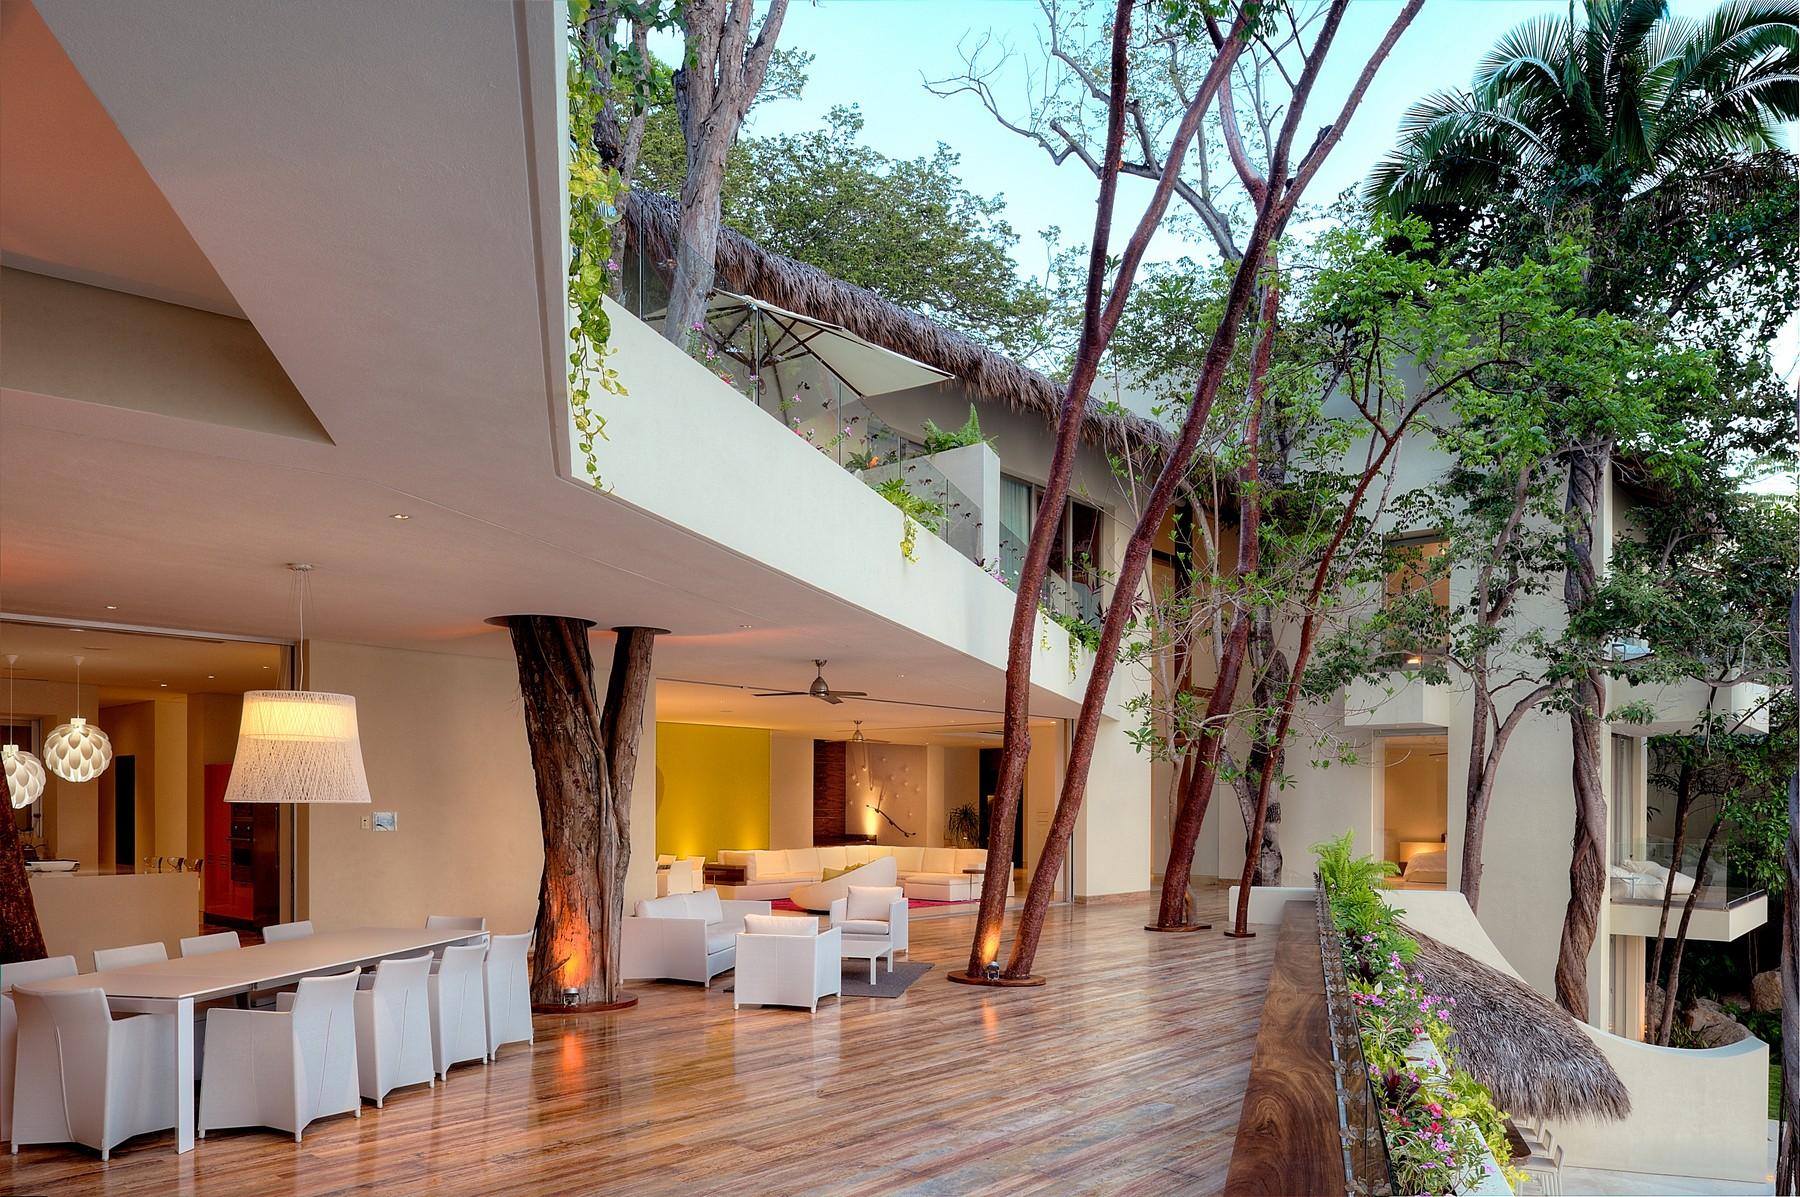 Additional photo for property listing at Casa Papelillos, El Paredon, Puerto Vallarta  Puerto Vallarta, Jalisco 48300 México